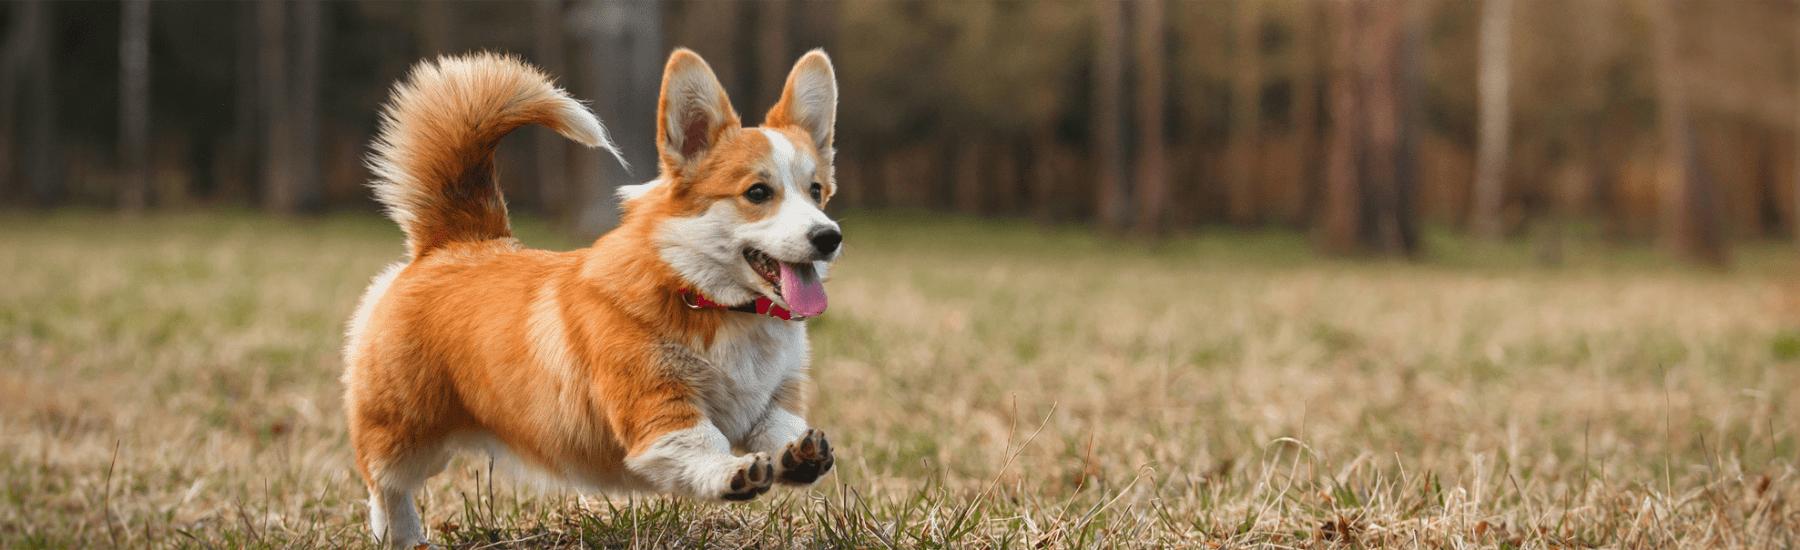 Corgi running in grass